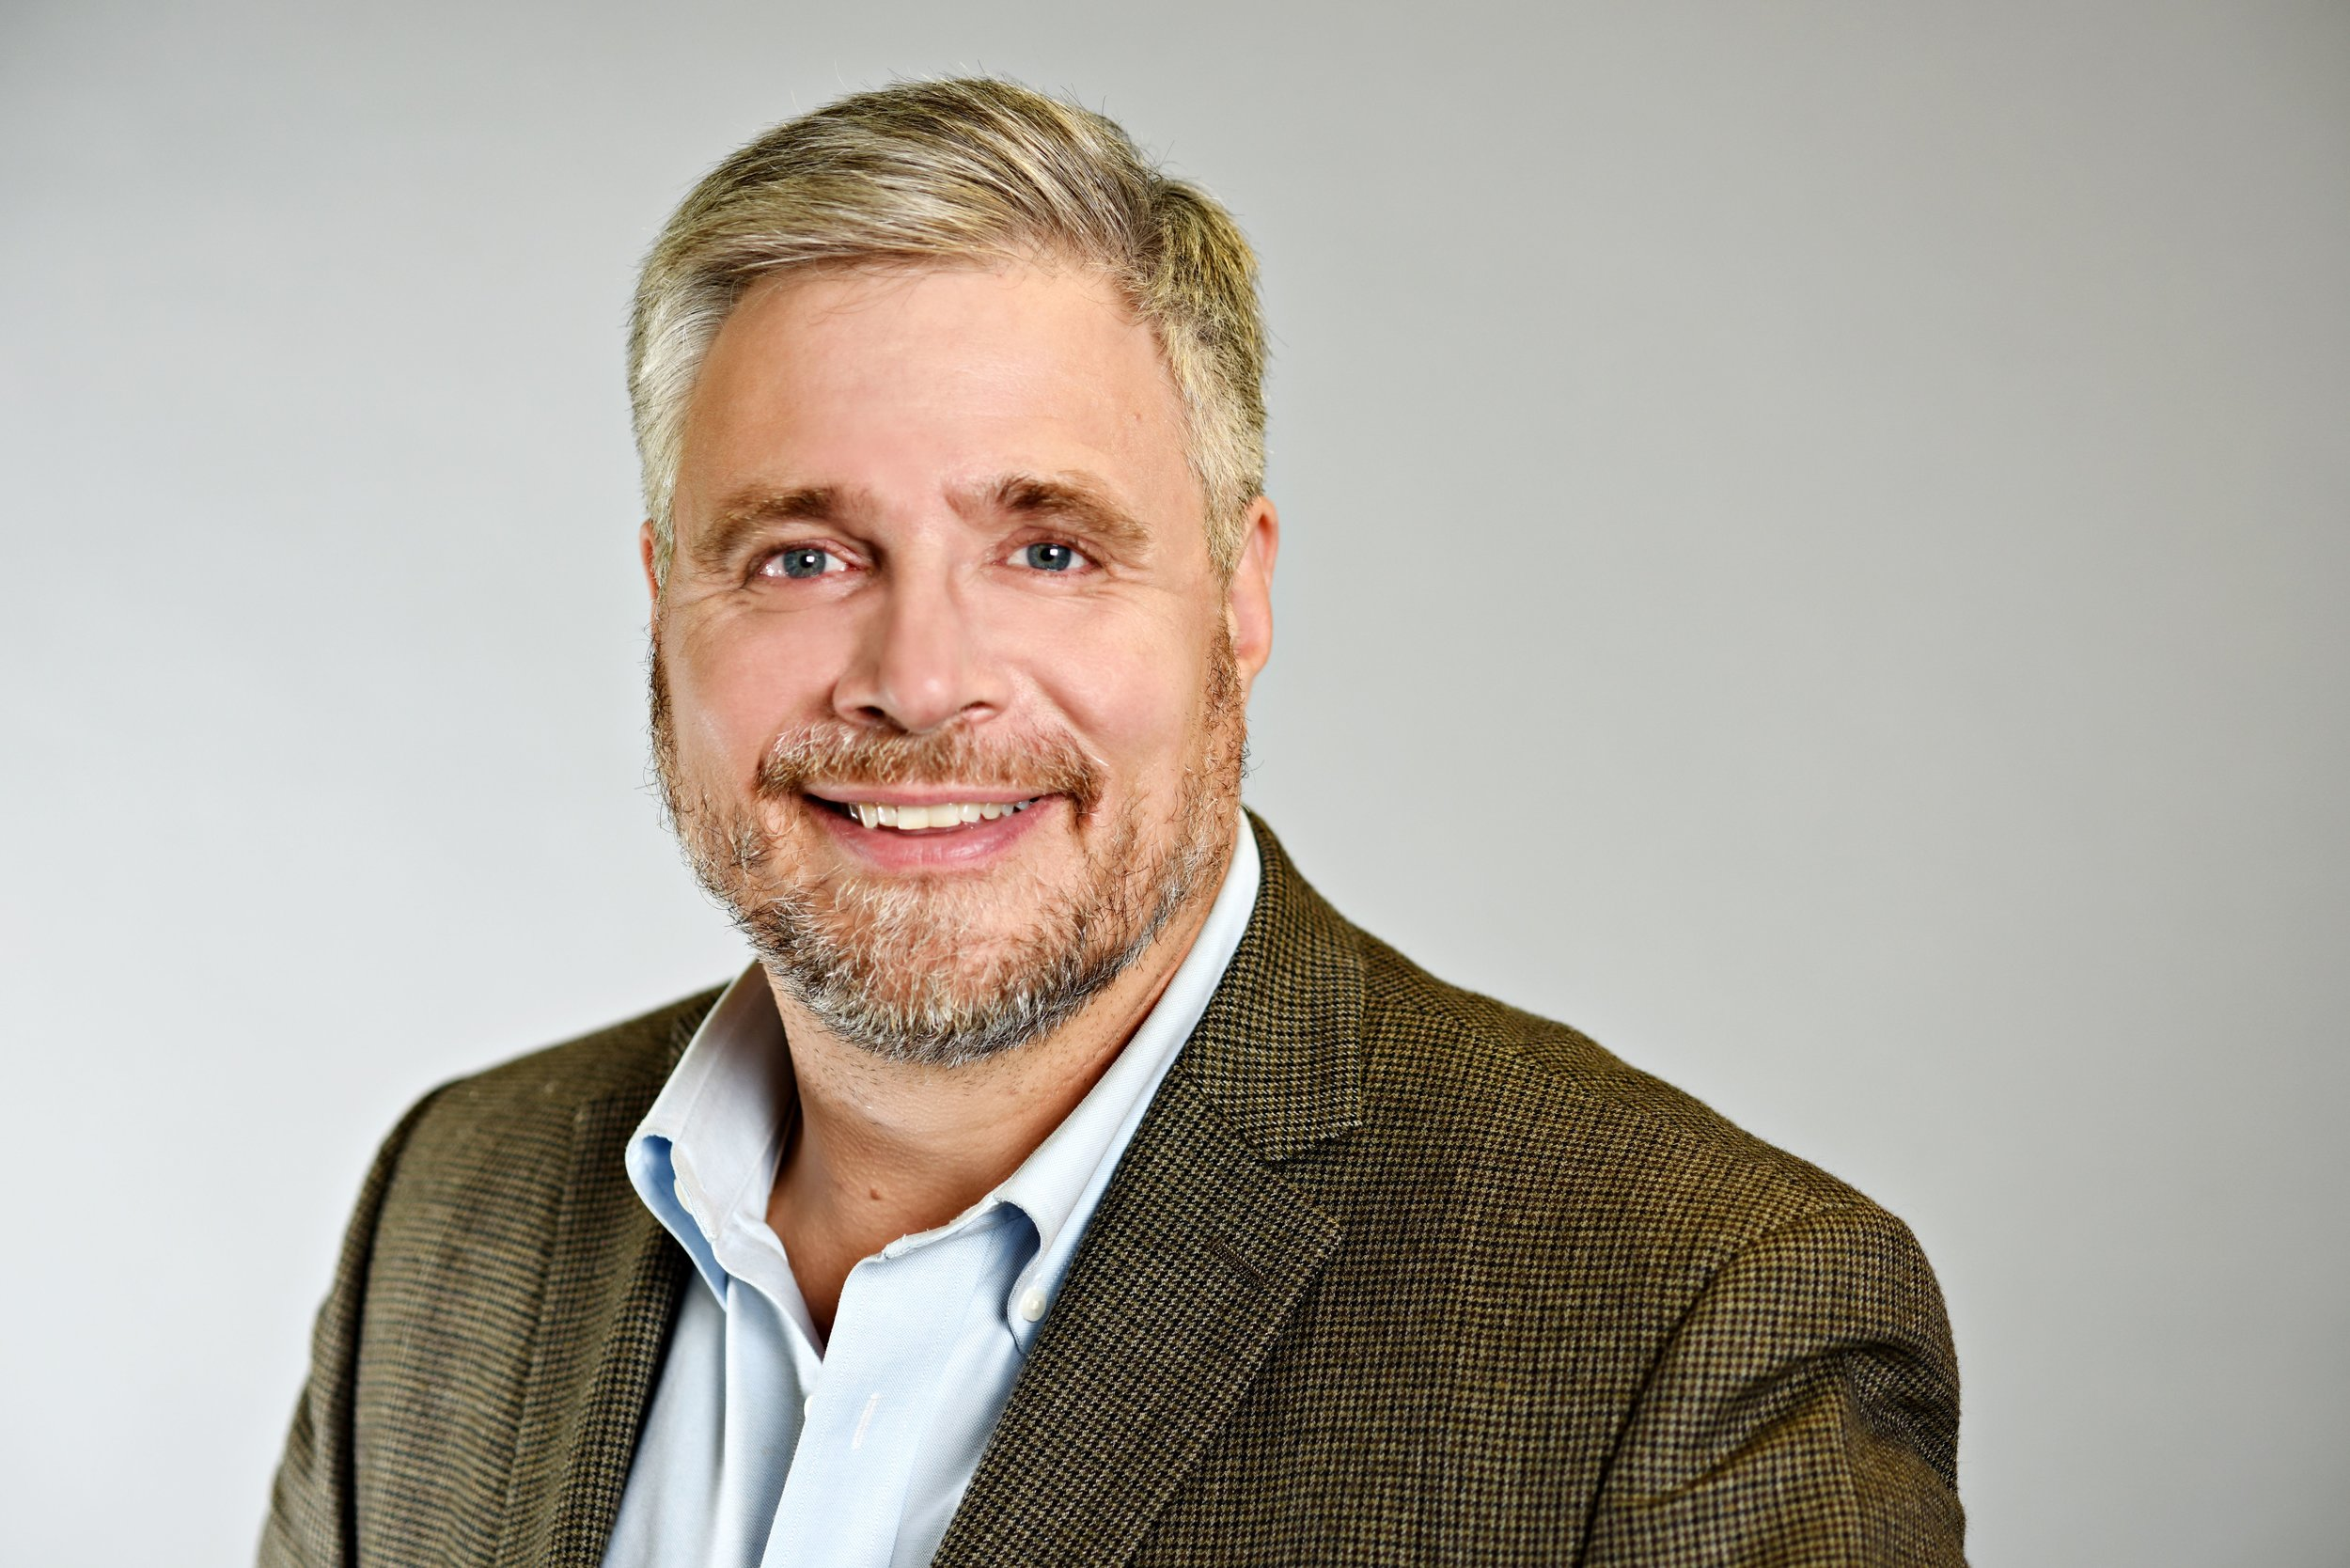 Emcee : Dr. Stephen Scharper, Associate Professor, U of T